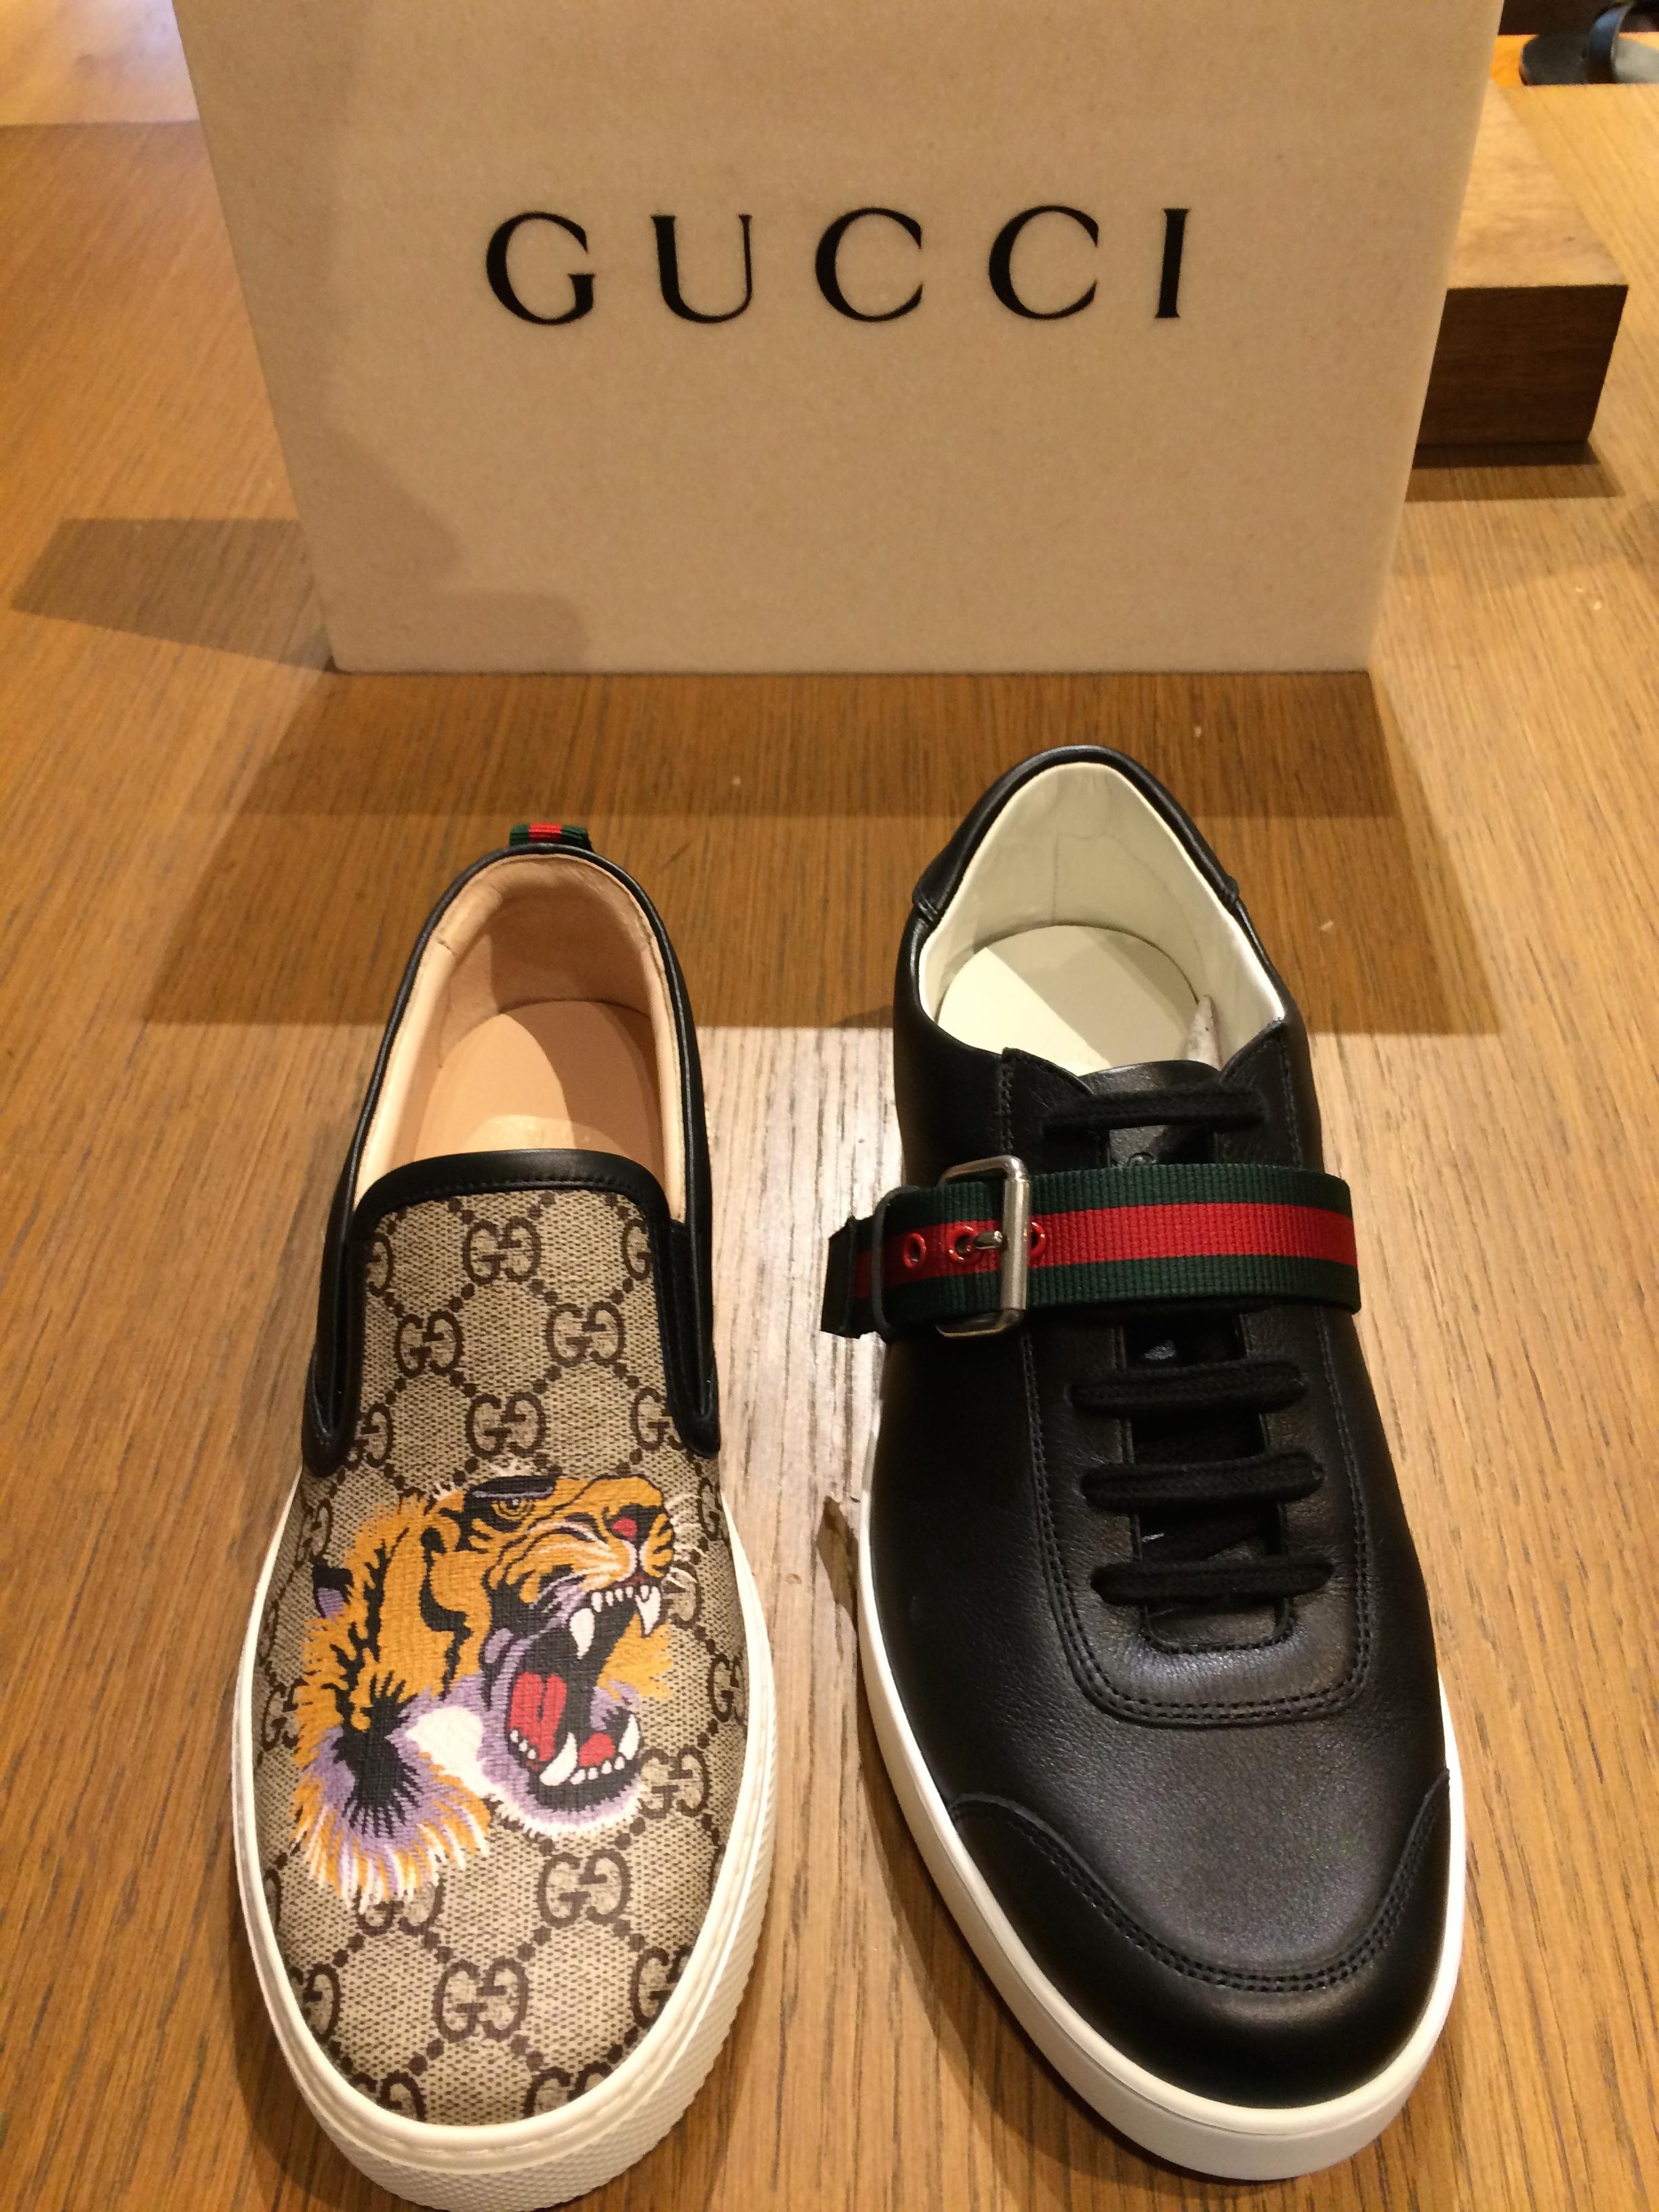 Gucci shoes at Selfridges, London – Oh